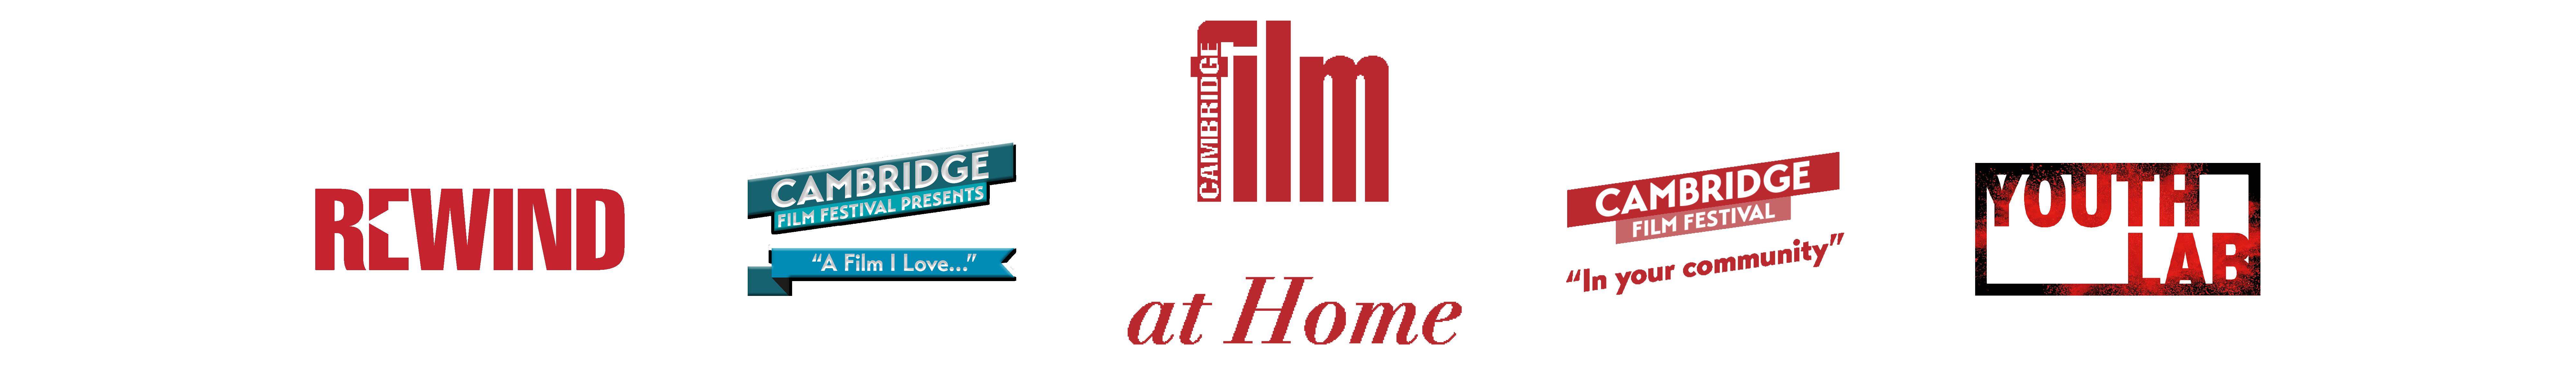 Cambridge Film Festival at Home